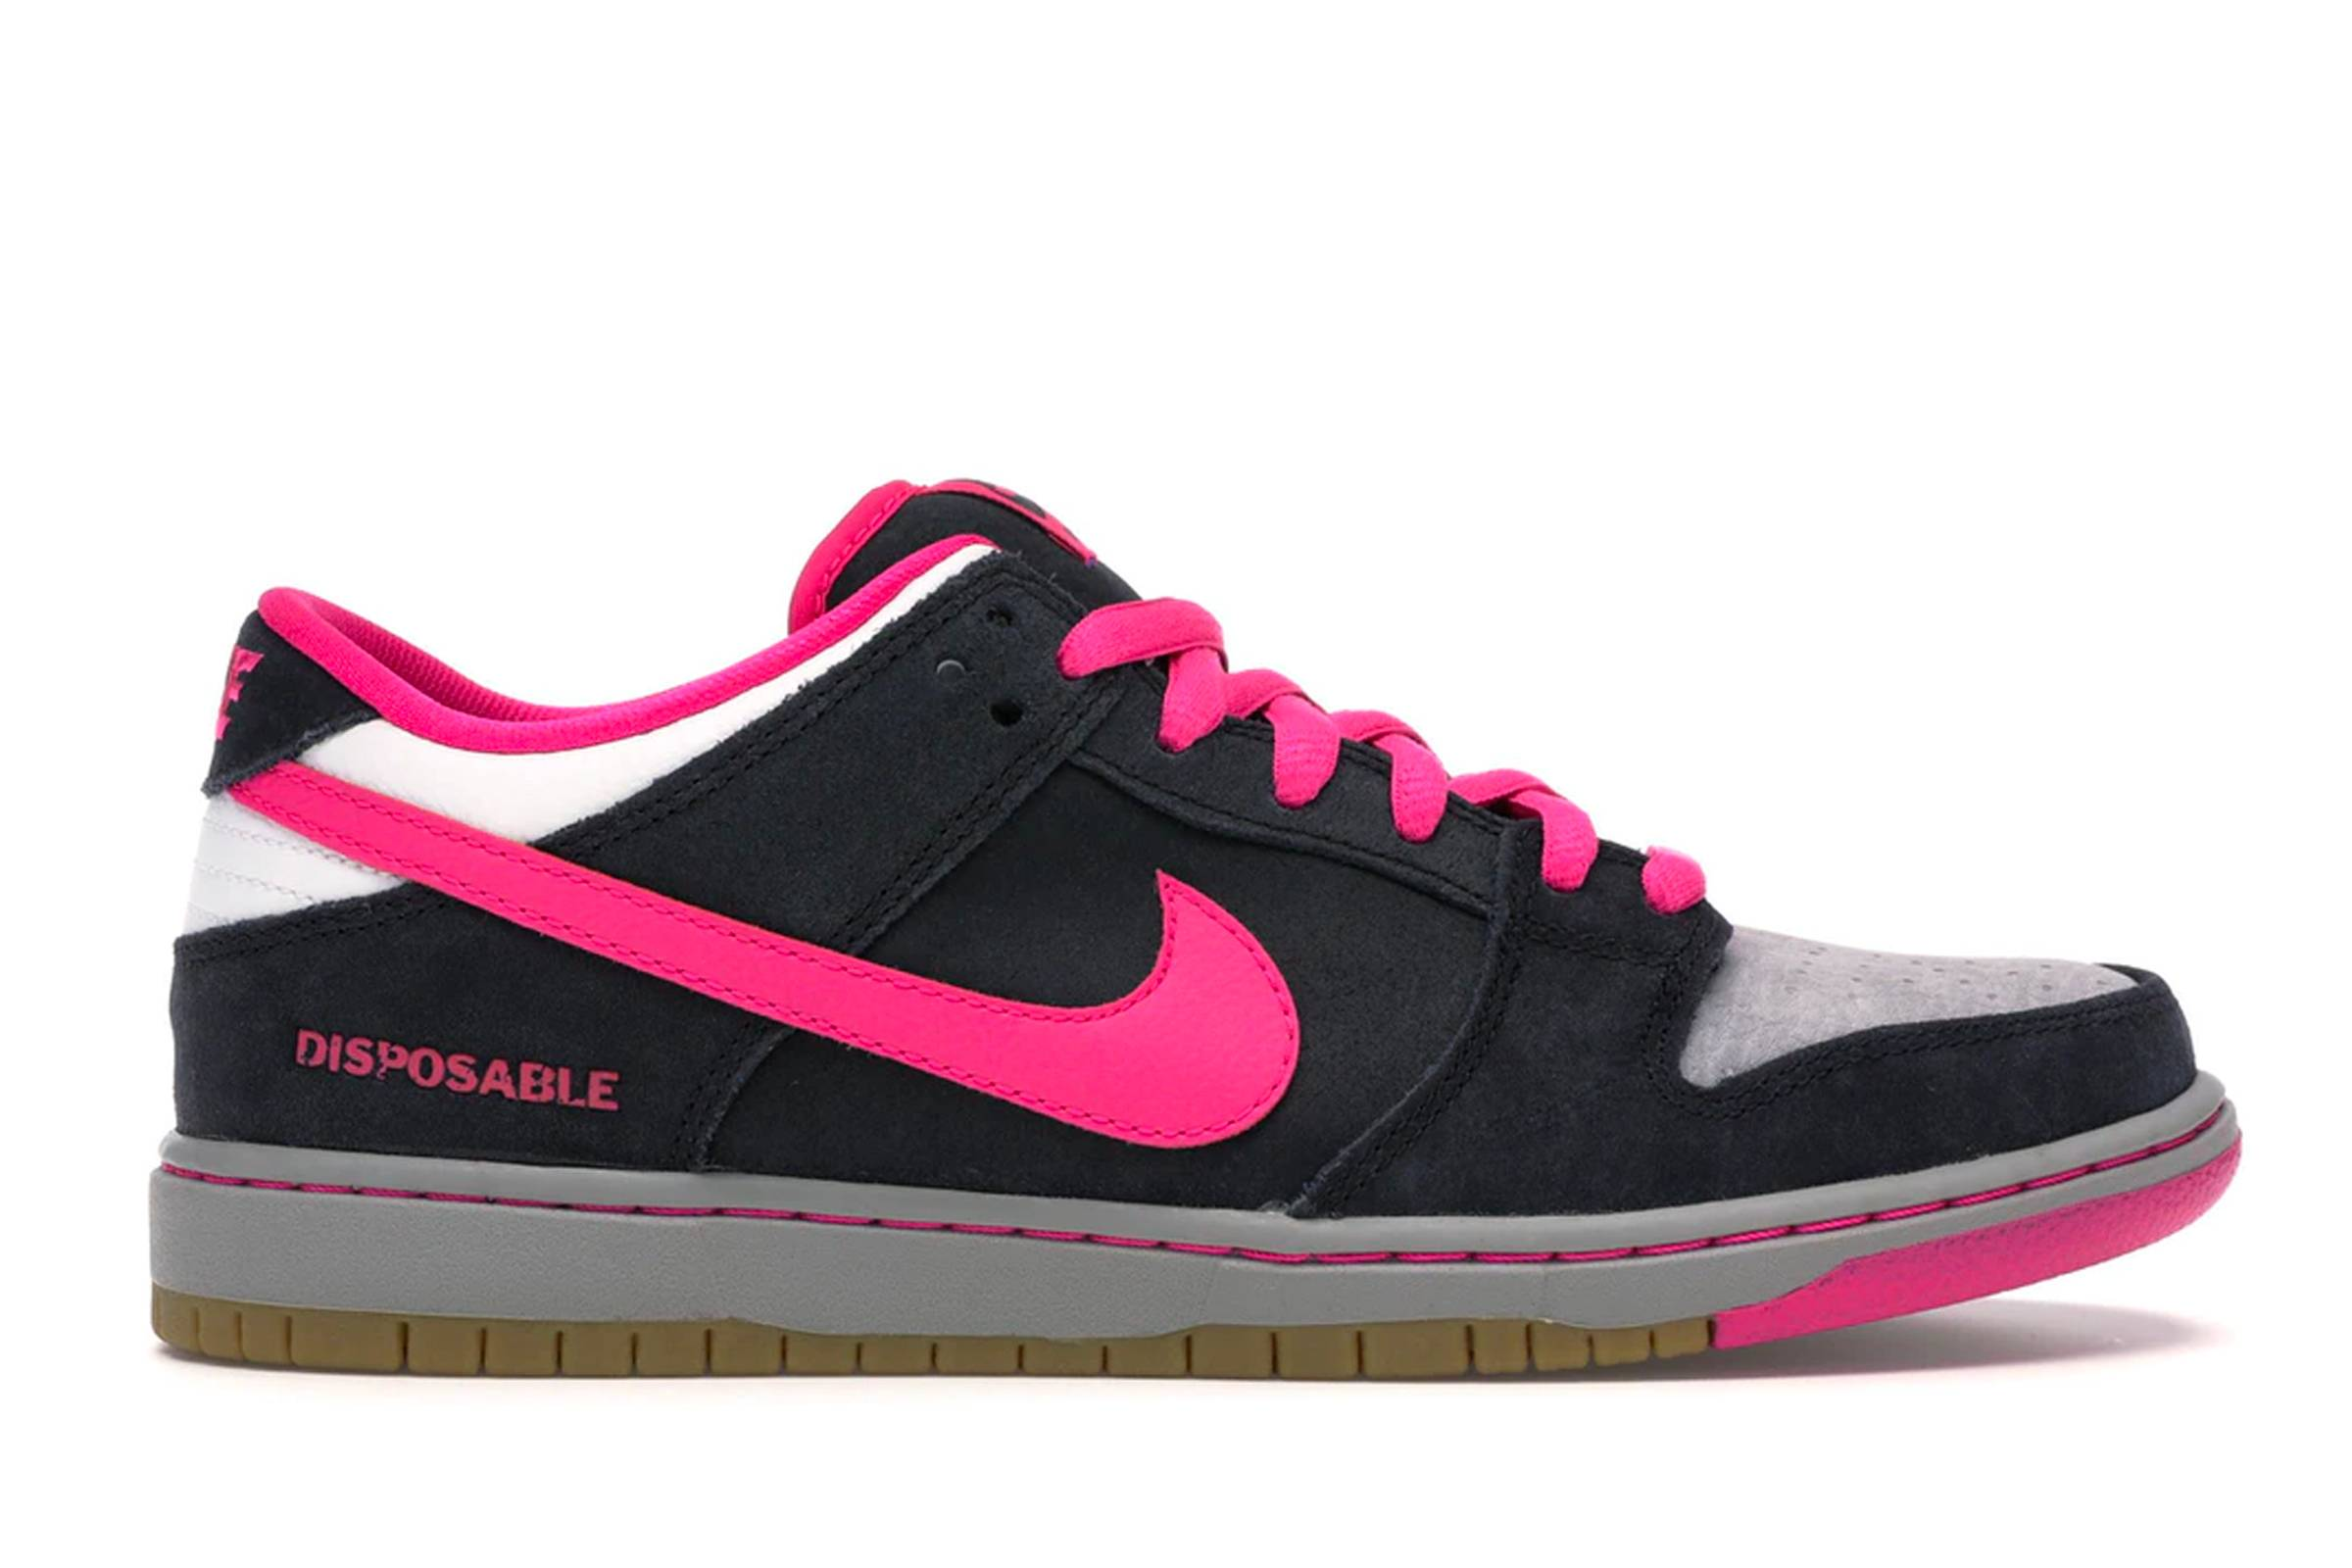 "Nike SB Dunk Low ""Disposable"""